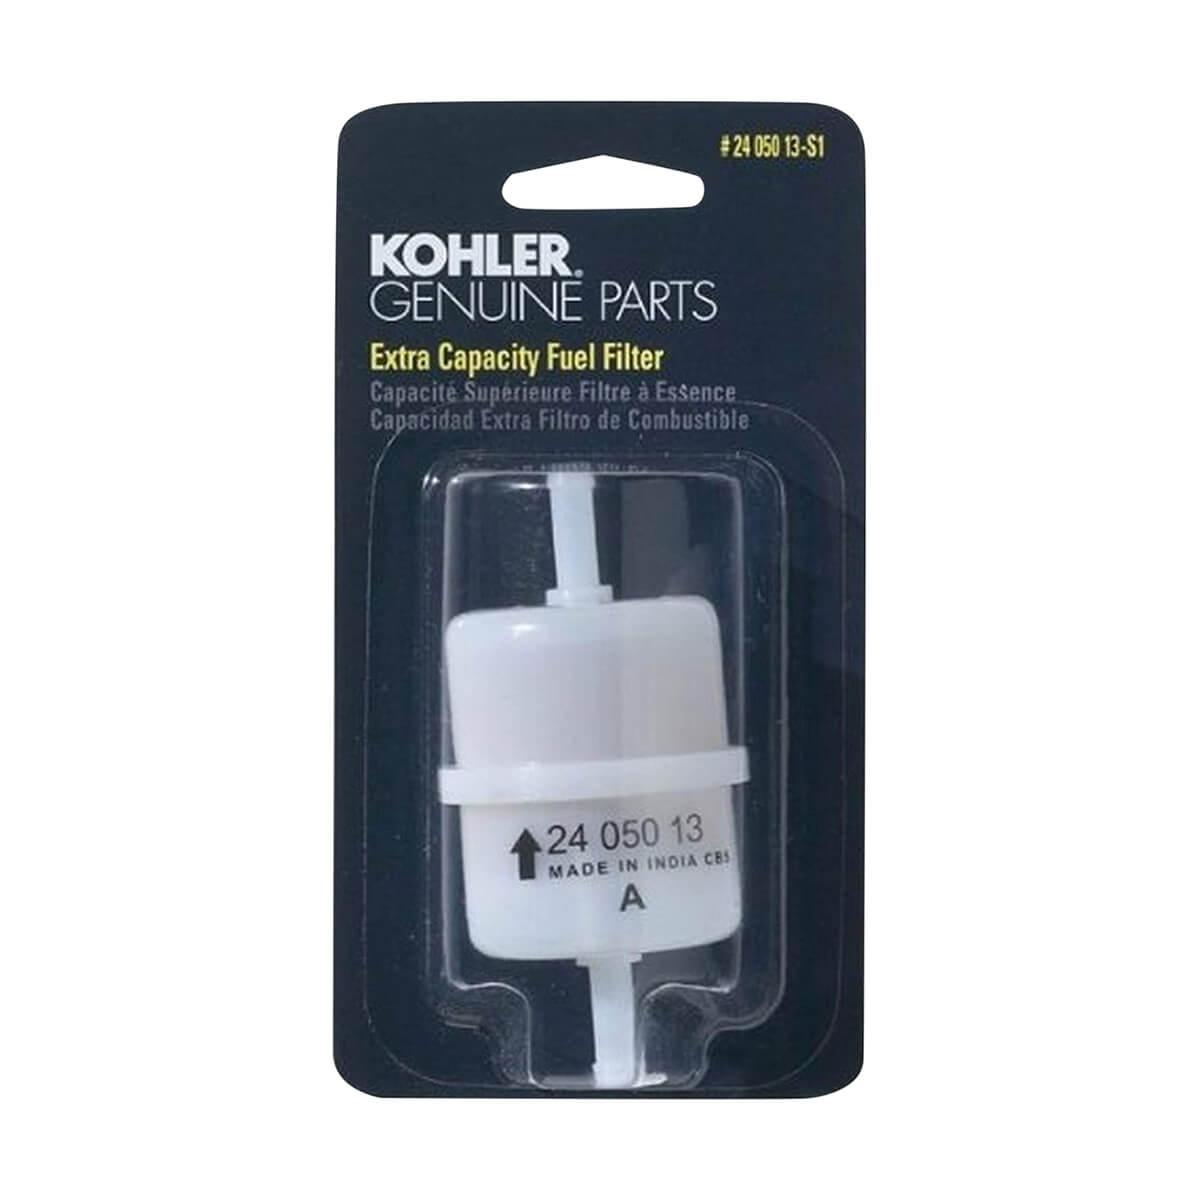 "Kohler 24 050 13-S1 Engine Fuel Filter 15 Micron W 1/4"" Inside Diameter"